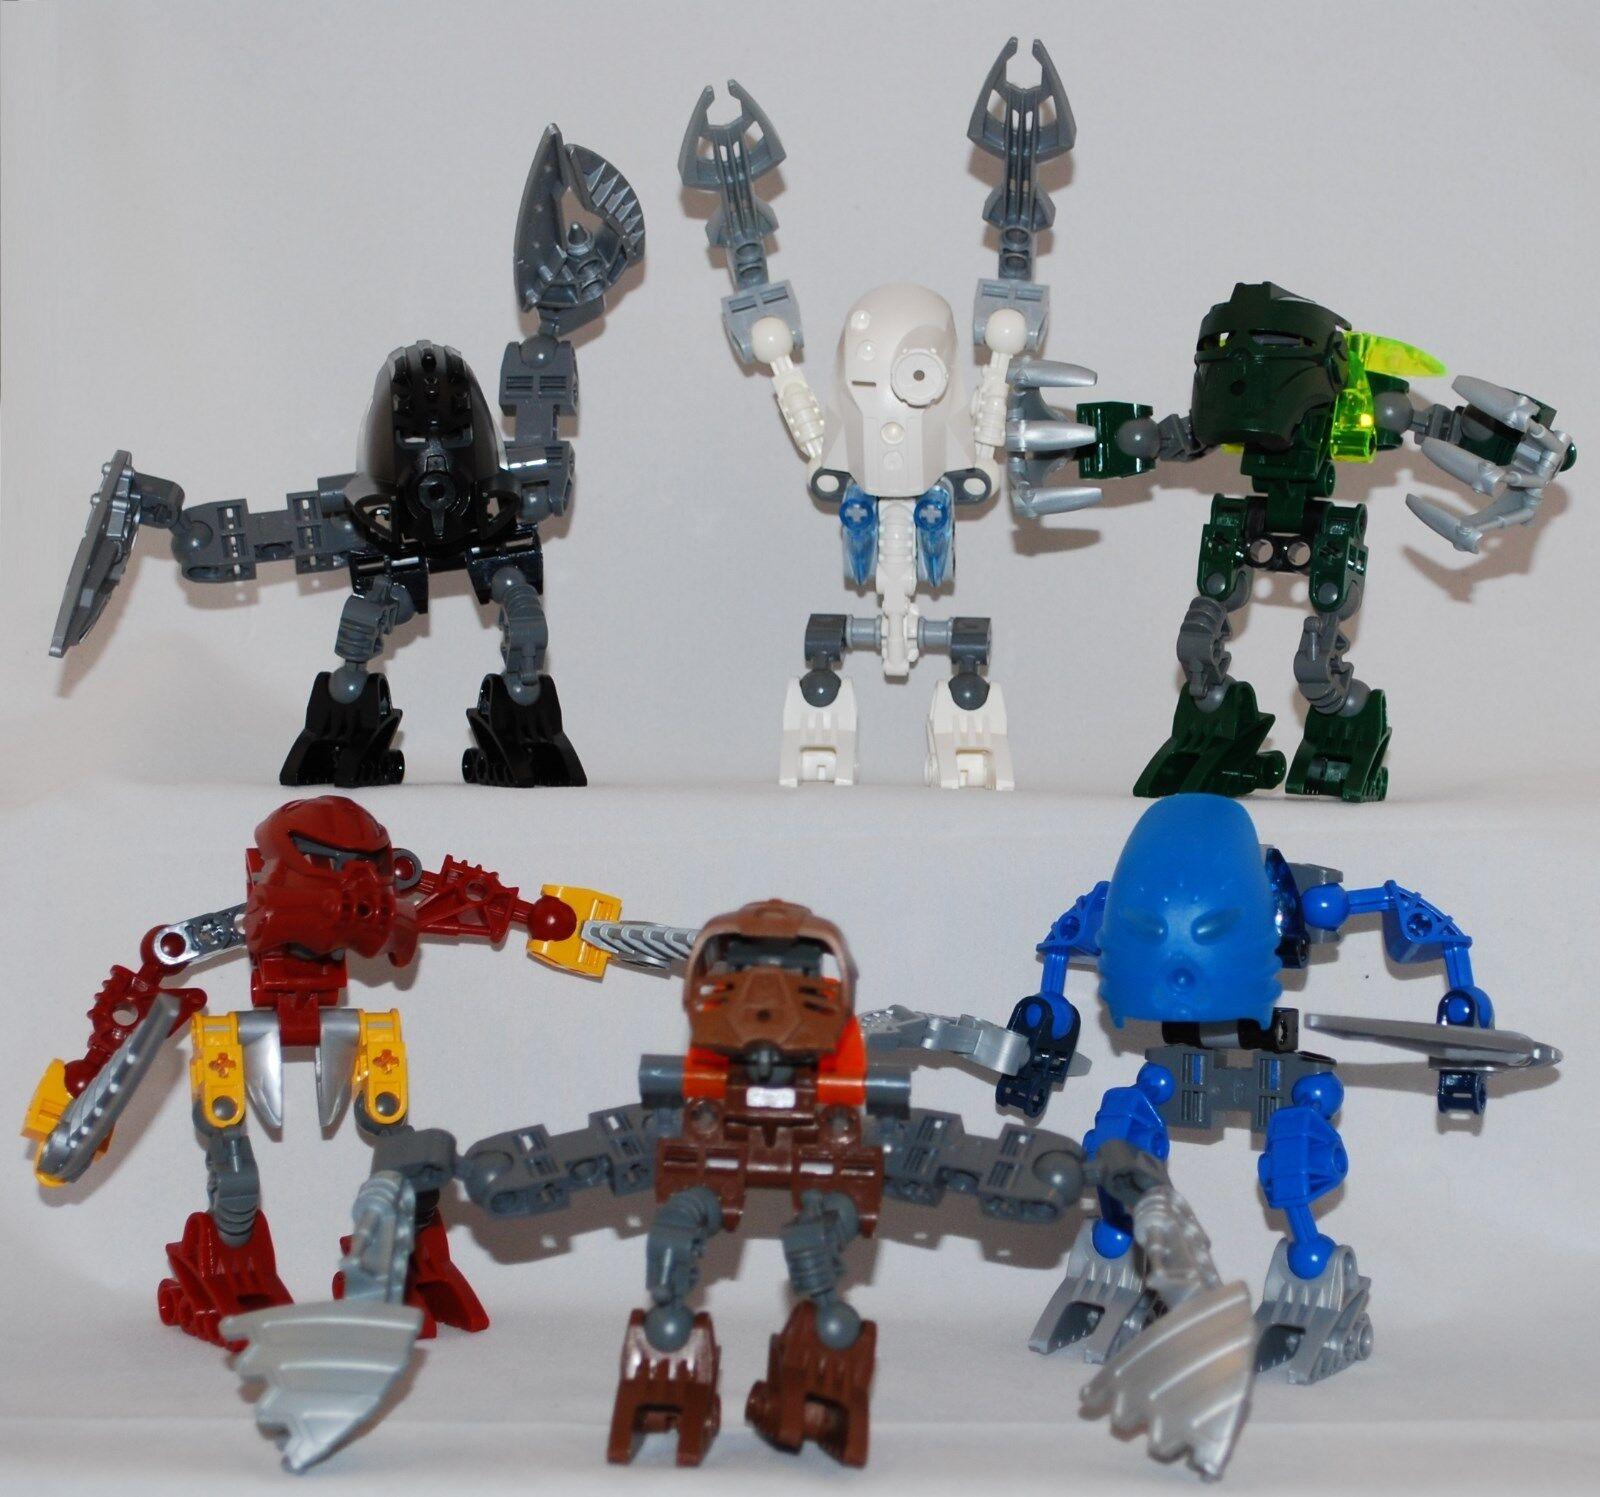 LEGO Bionicle Set  All 6 figures  8721, 8722, 8723, 8724, 8725, 8726